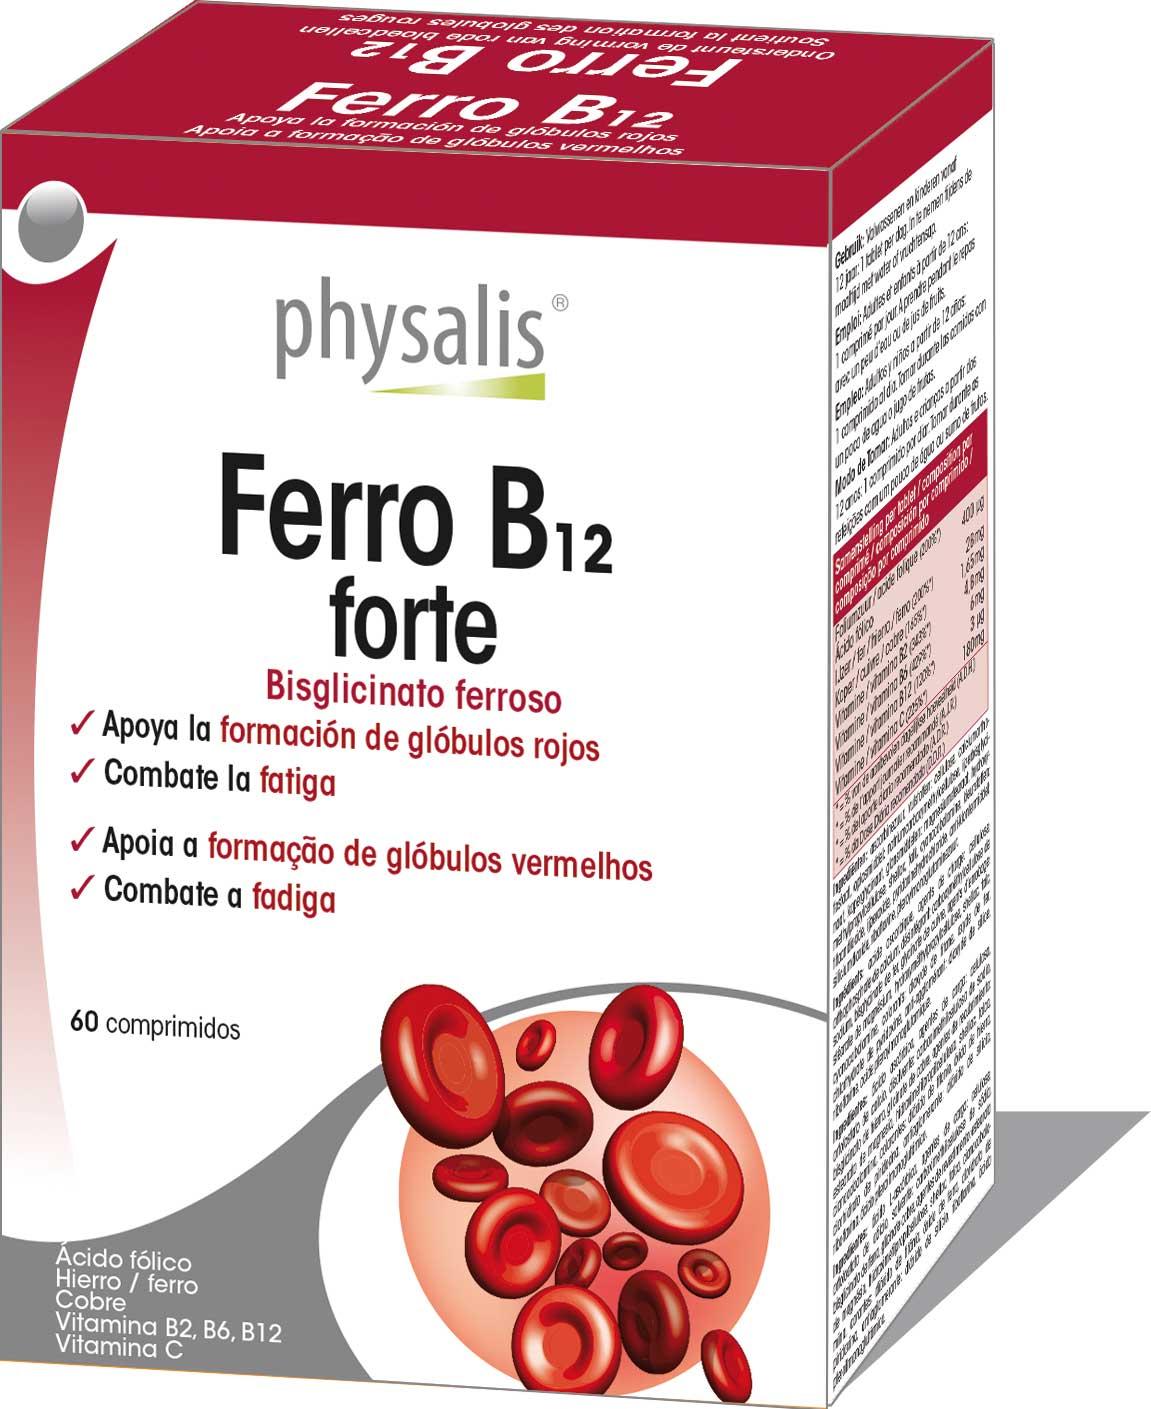 Ferro B12 forte  Keypharm Complementos alimenticios naturales